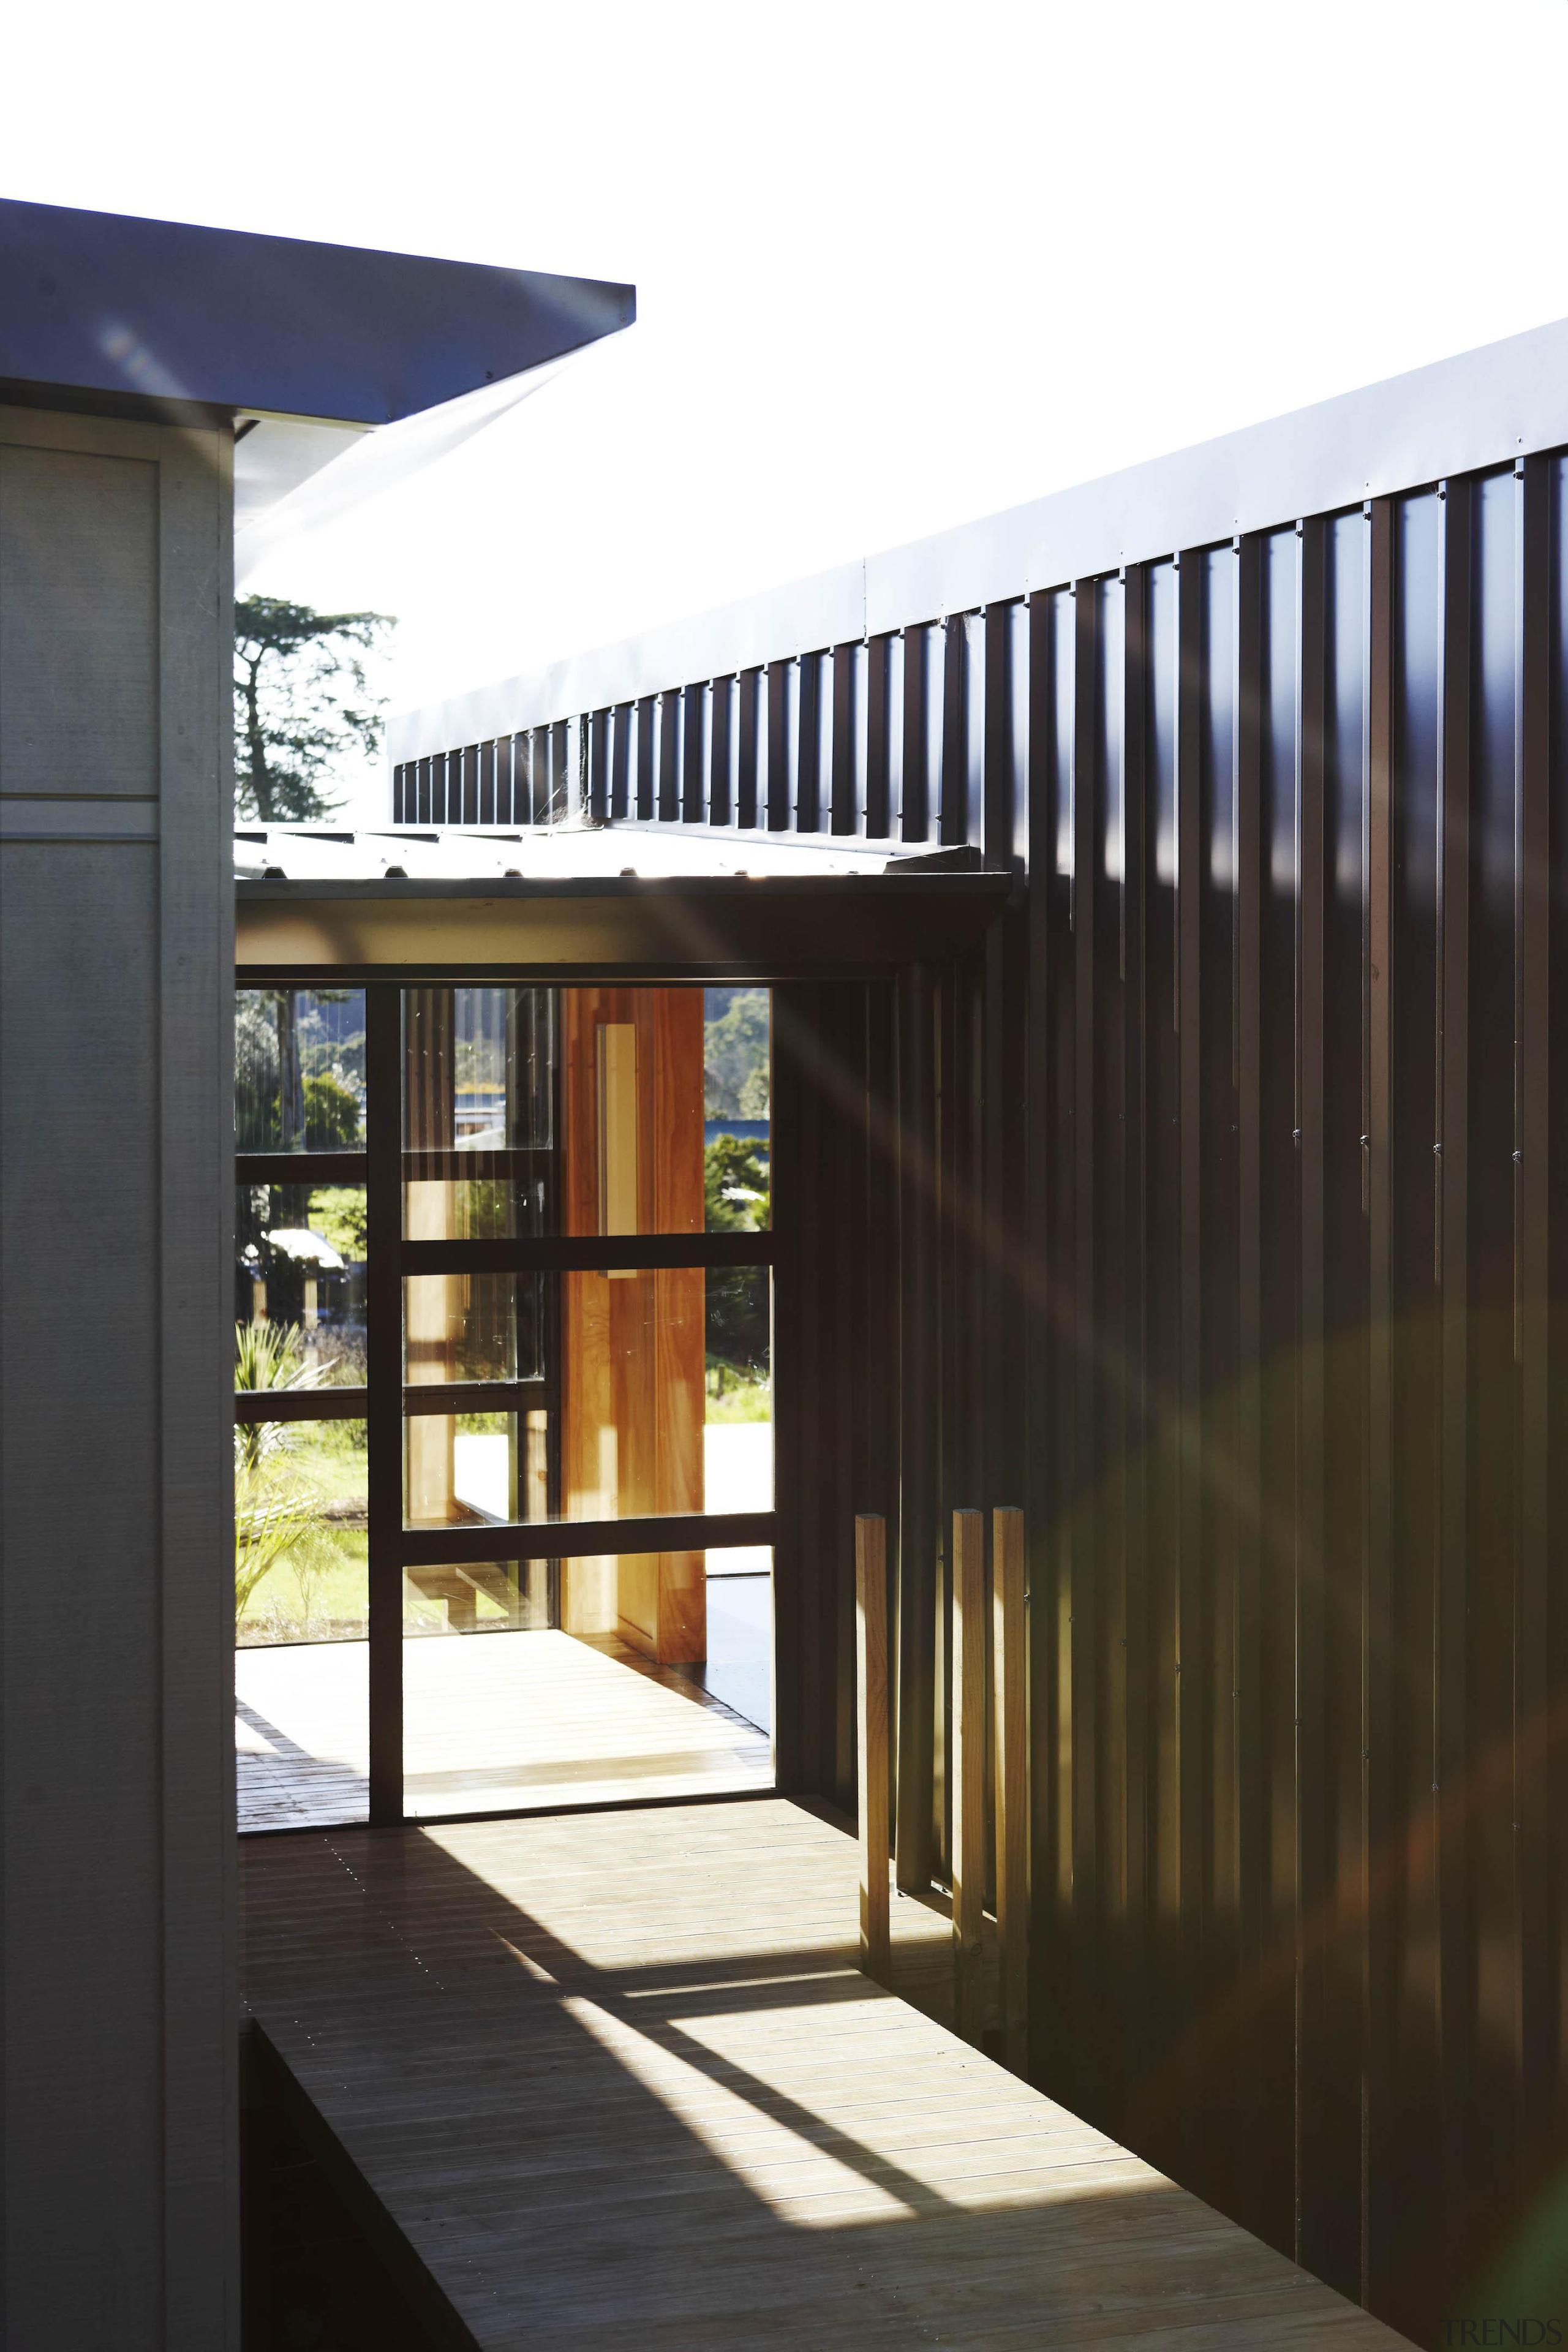 Waitakere Ranges - Studio 19 VisionWest Community Housing architecture, daylighting, facade, house, black, white